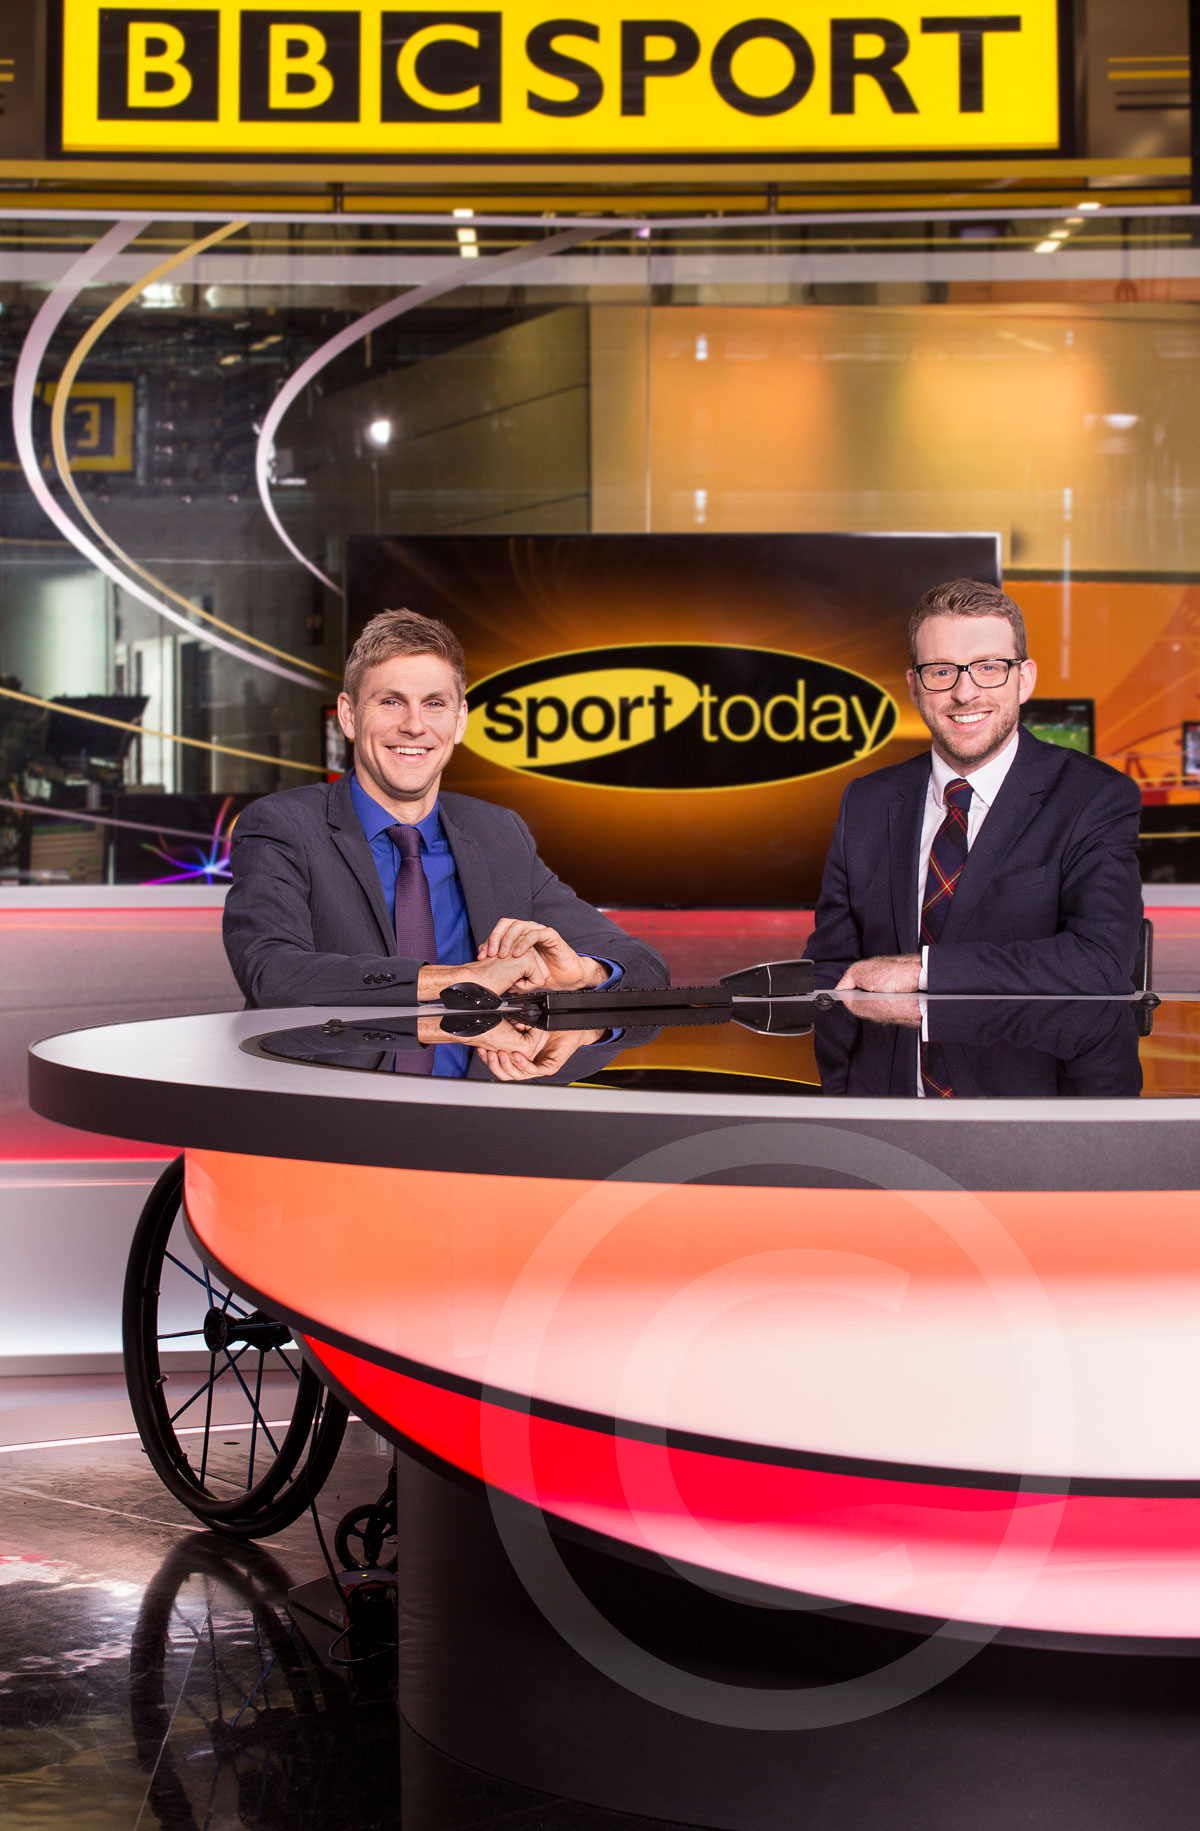 BBC-JJchalmers-radio-manchester-presenter-photography-